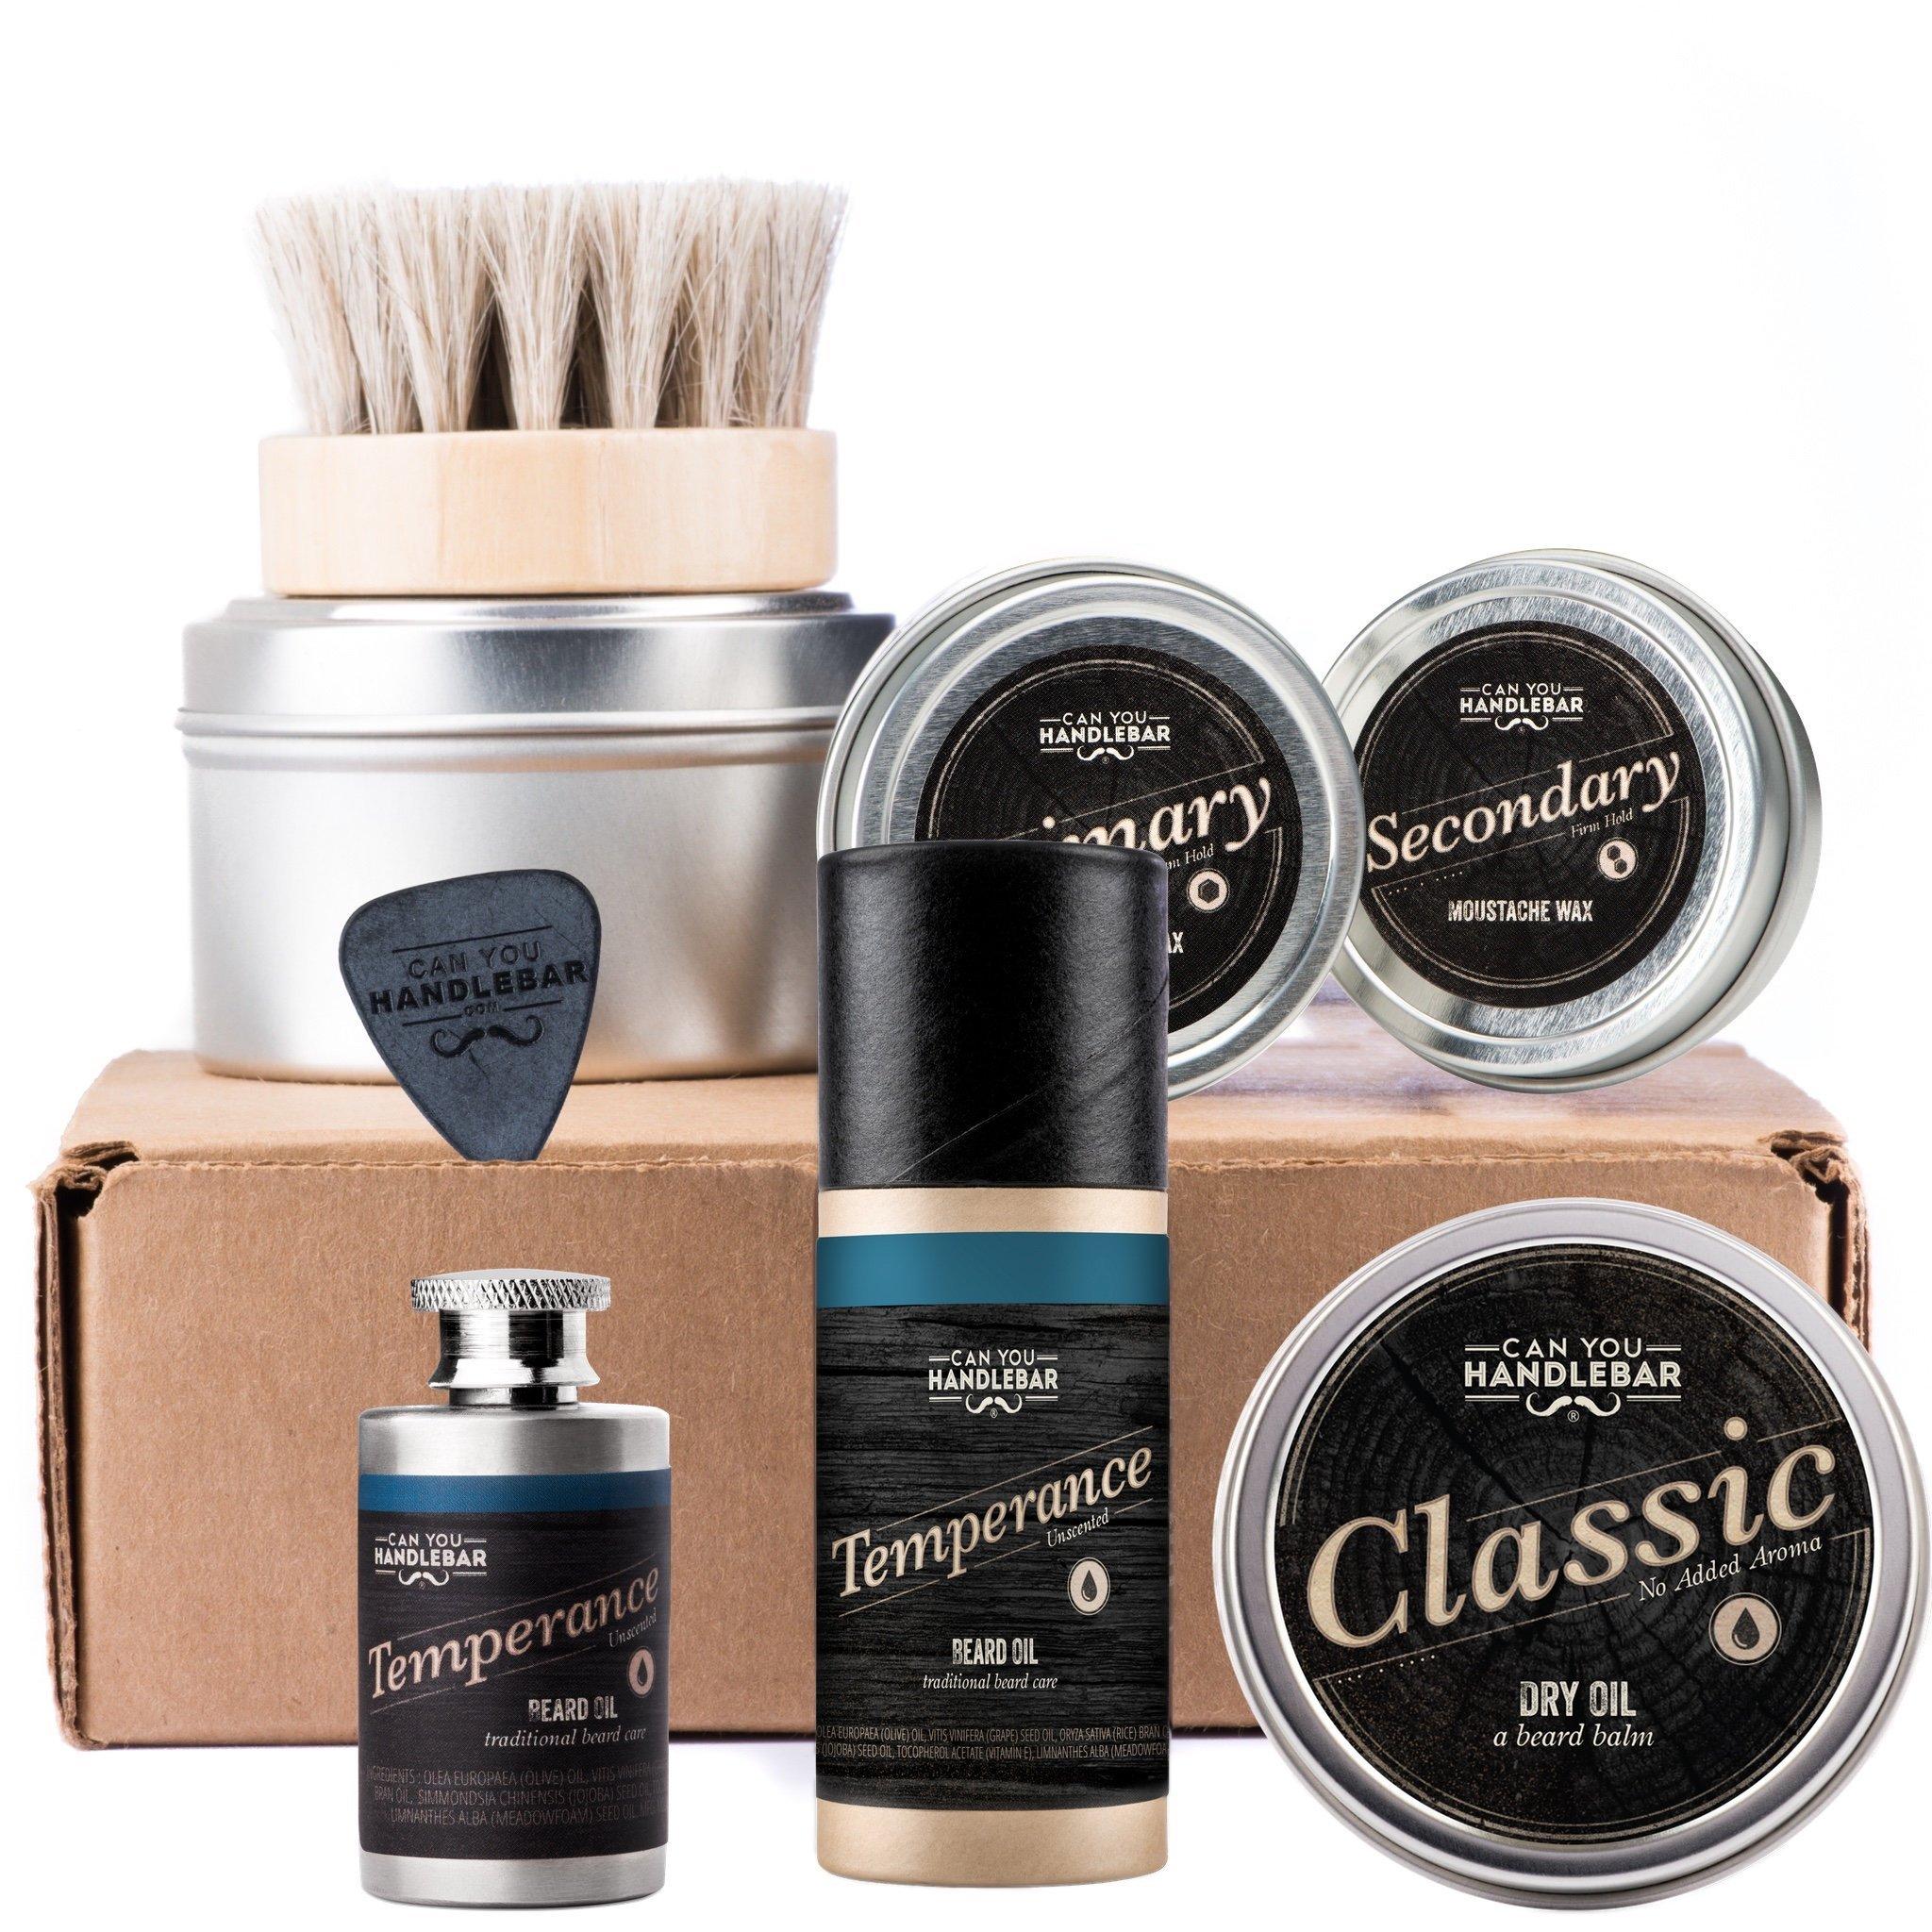 CanYouHandlebar Ultimate Beard Care Kit : Temperance - Unscented